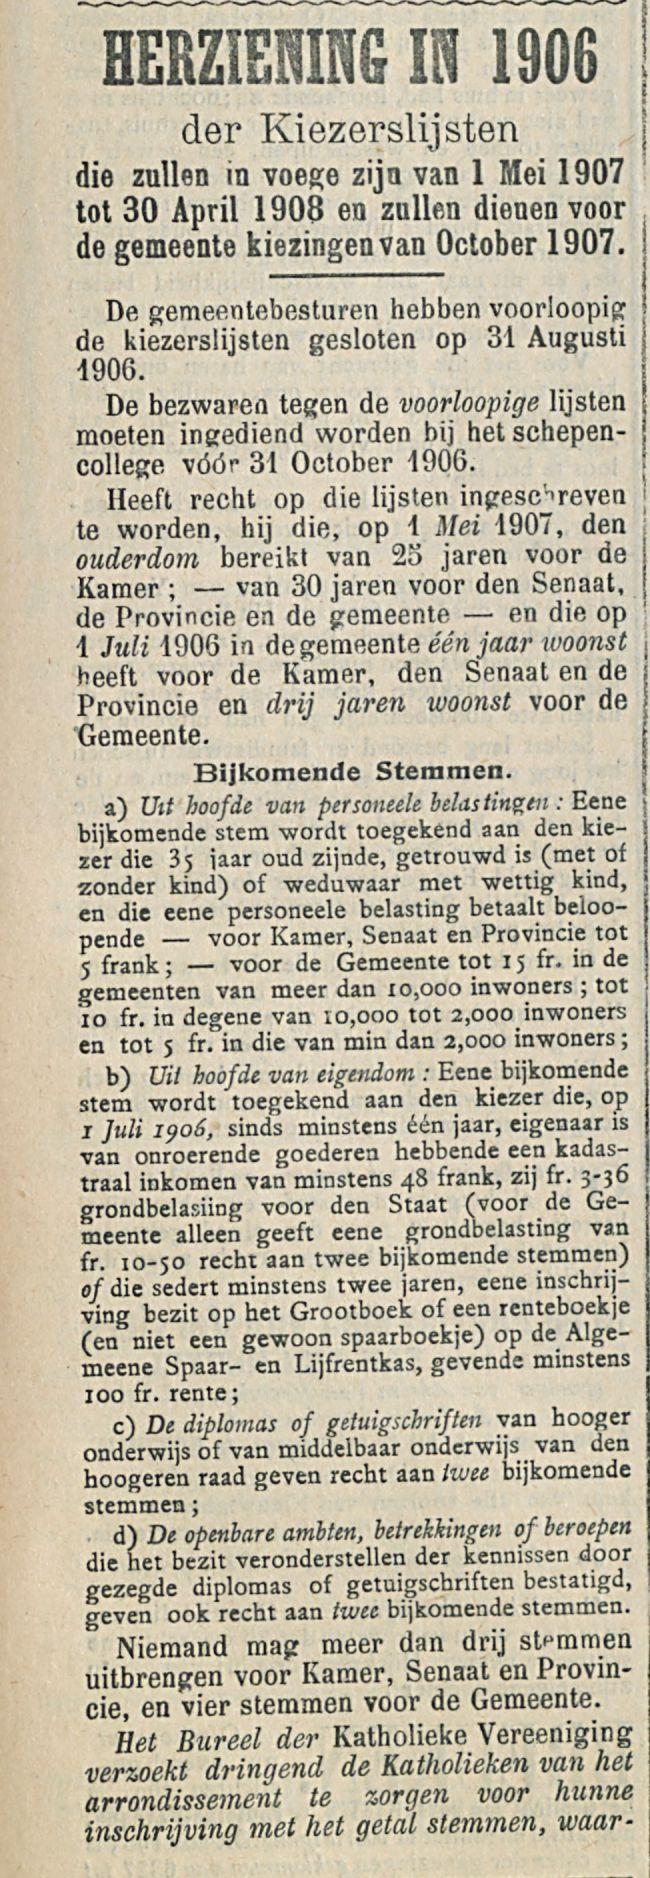 HERZIENING IN 1906